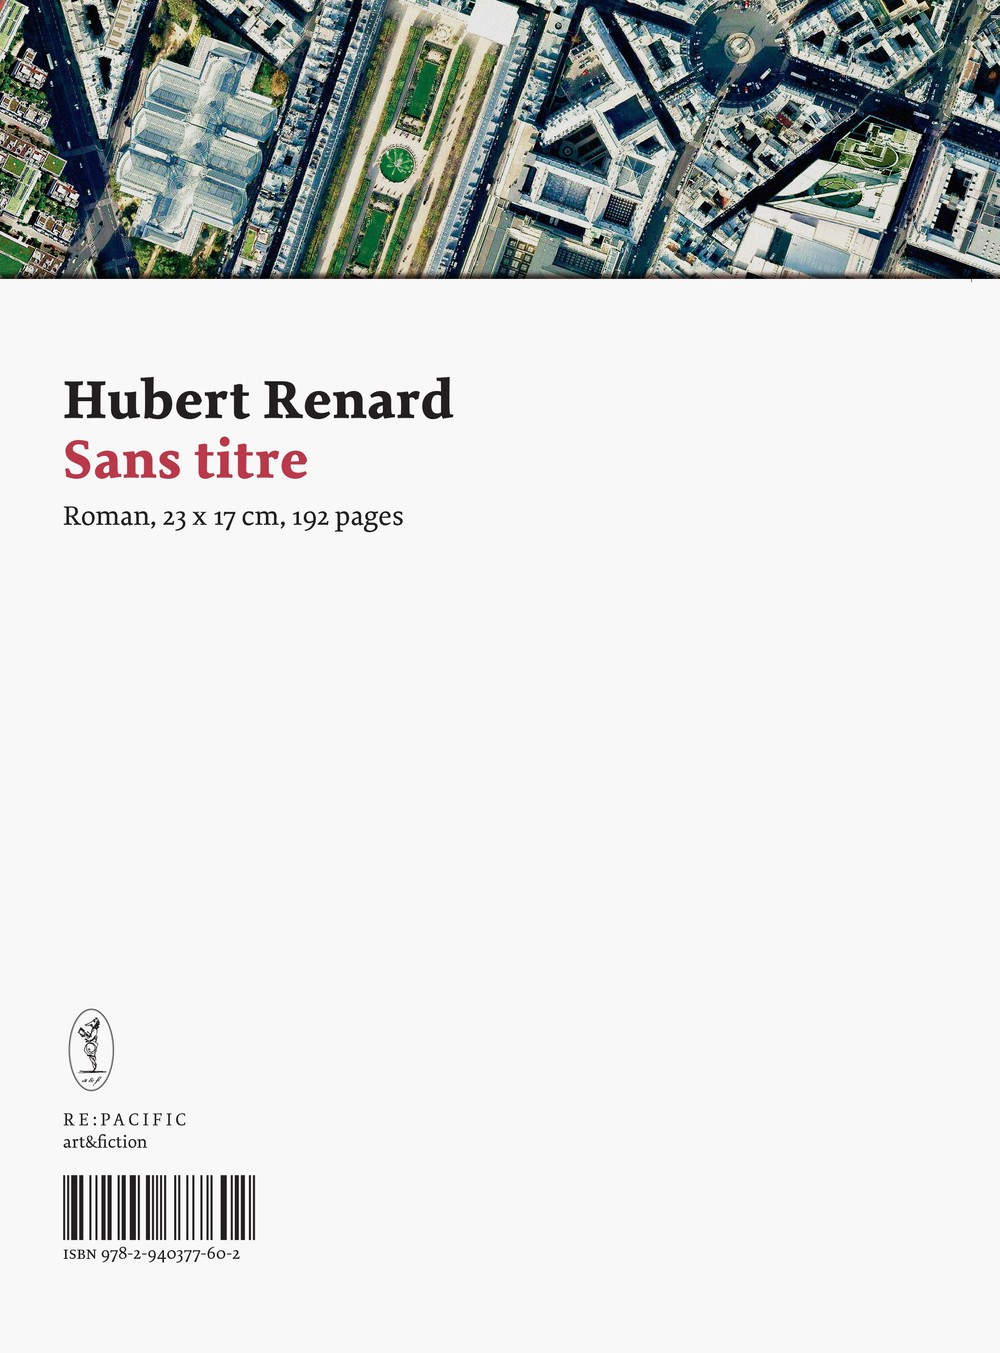 © Hubert Renard et art&fiction